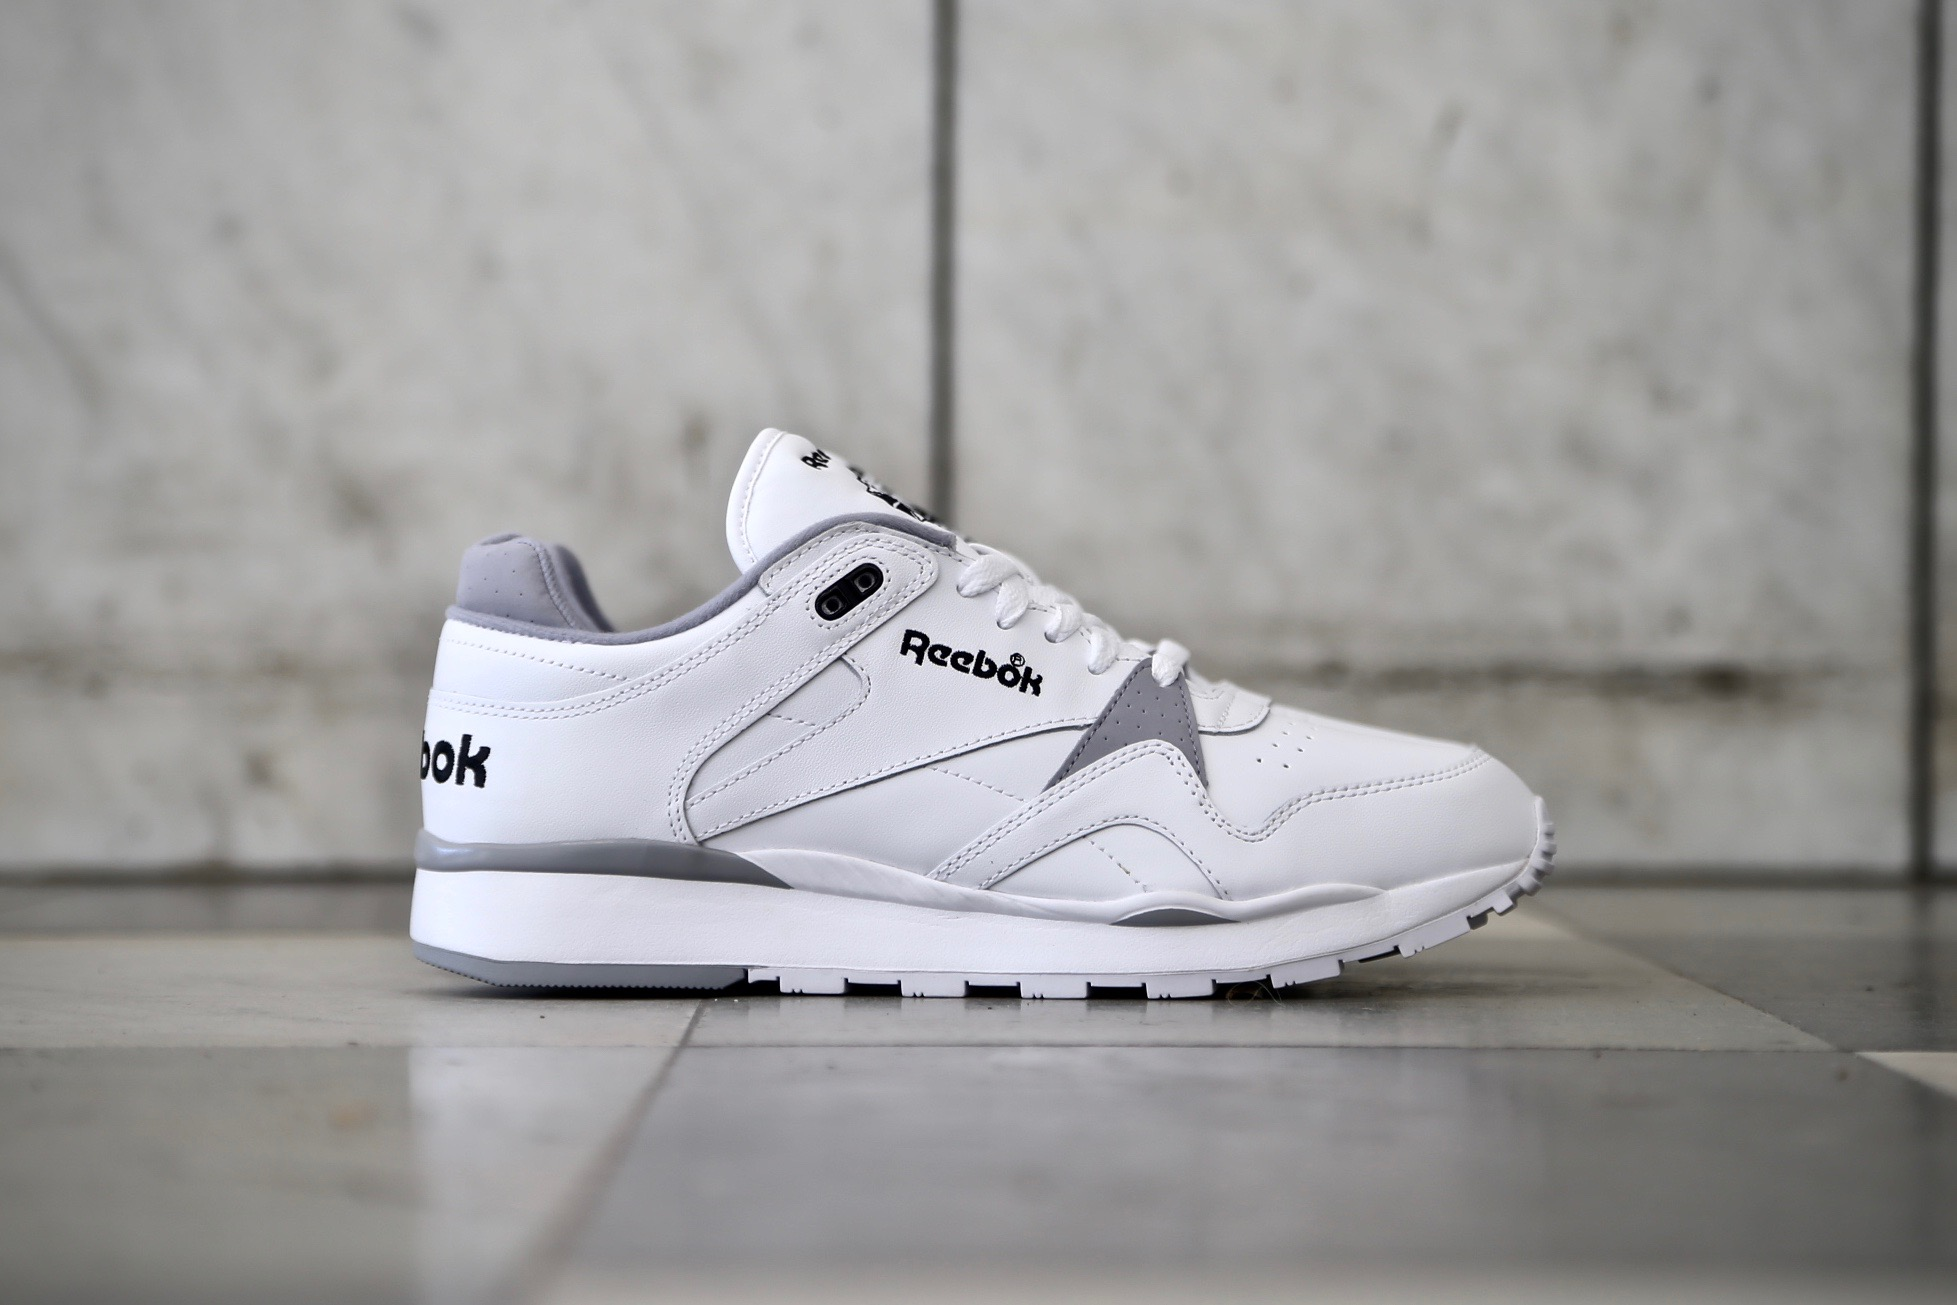 d48d033cfa7 Reebok CL Leather II – White   Black – STASP